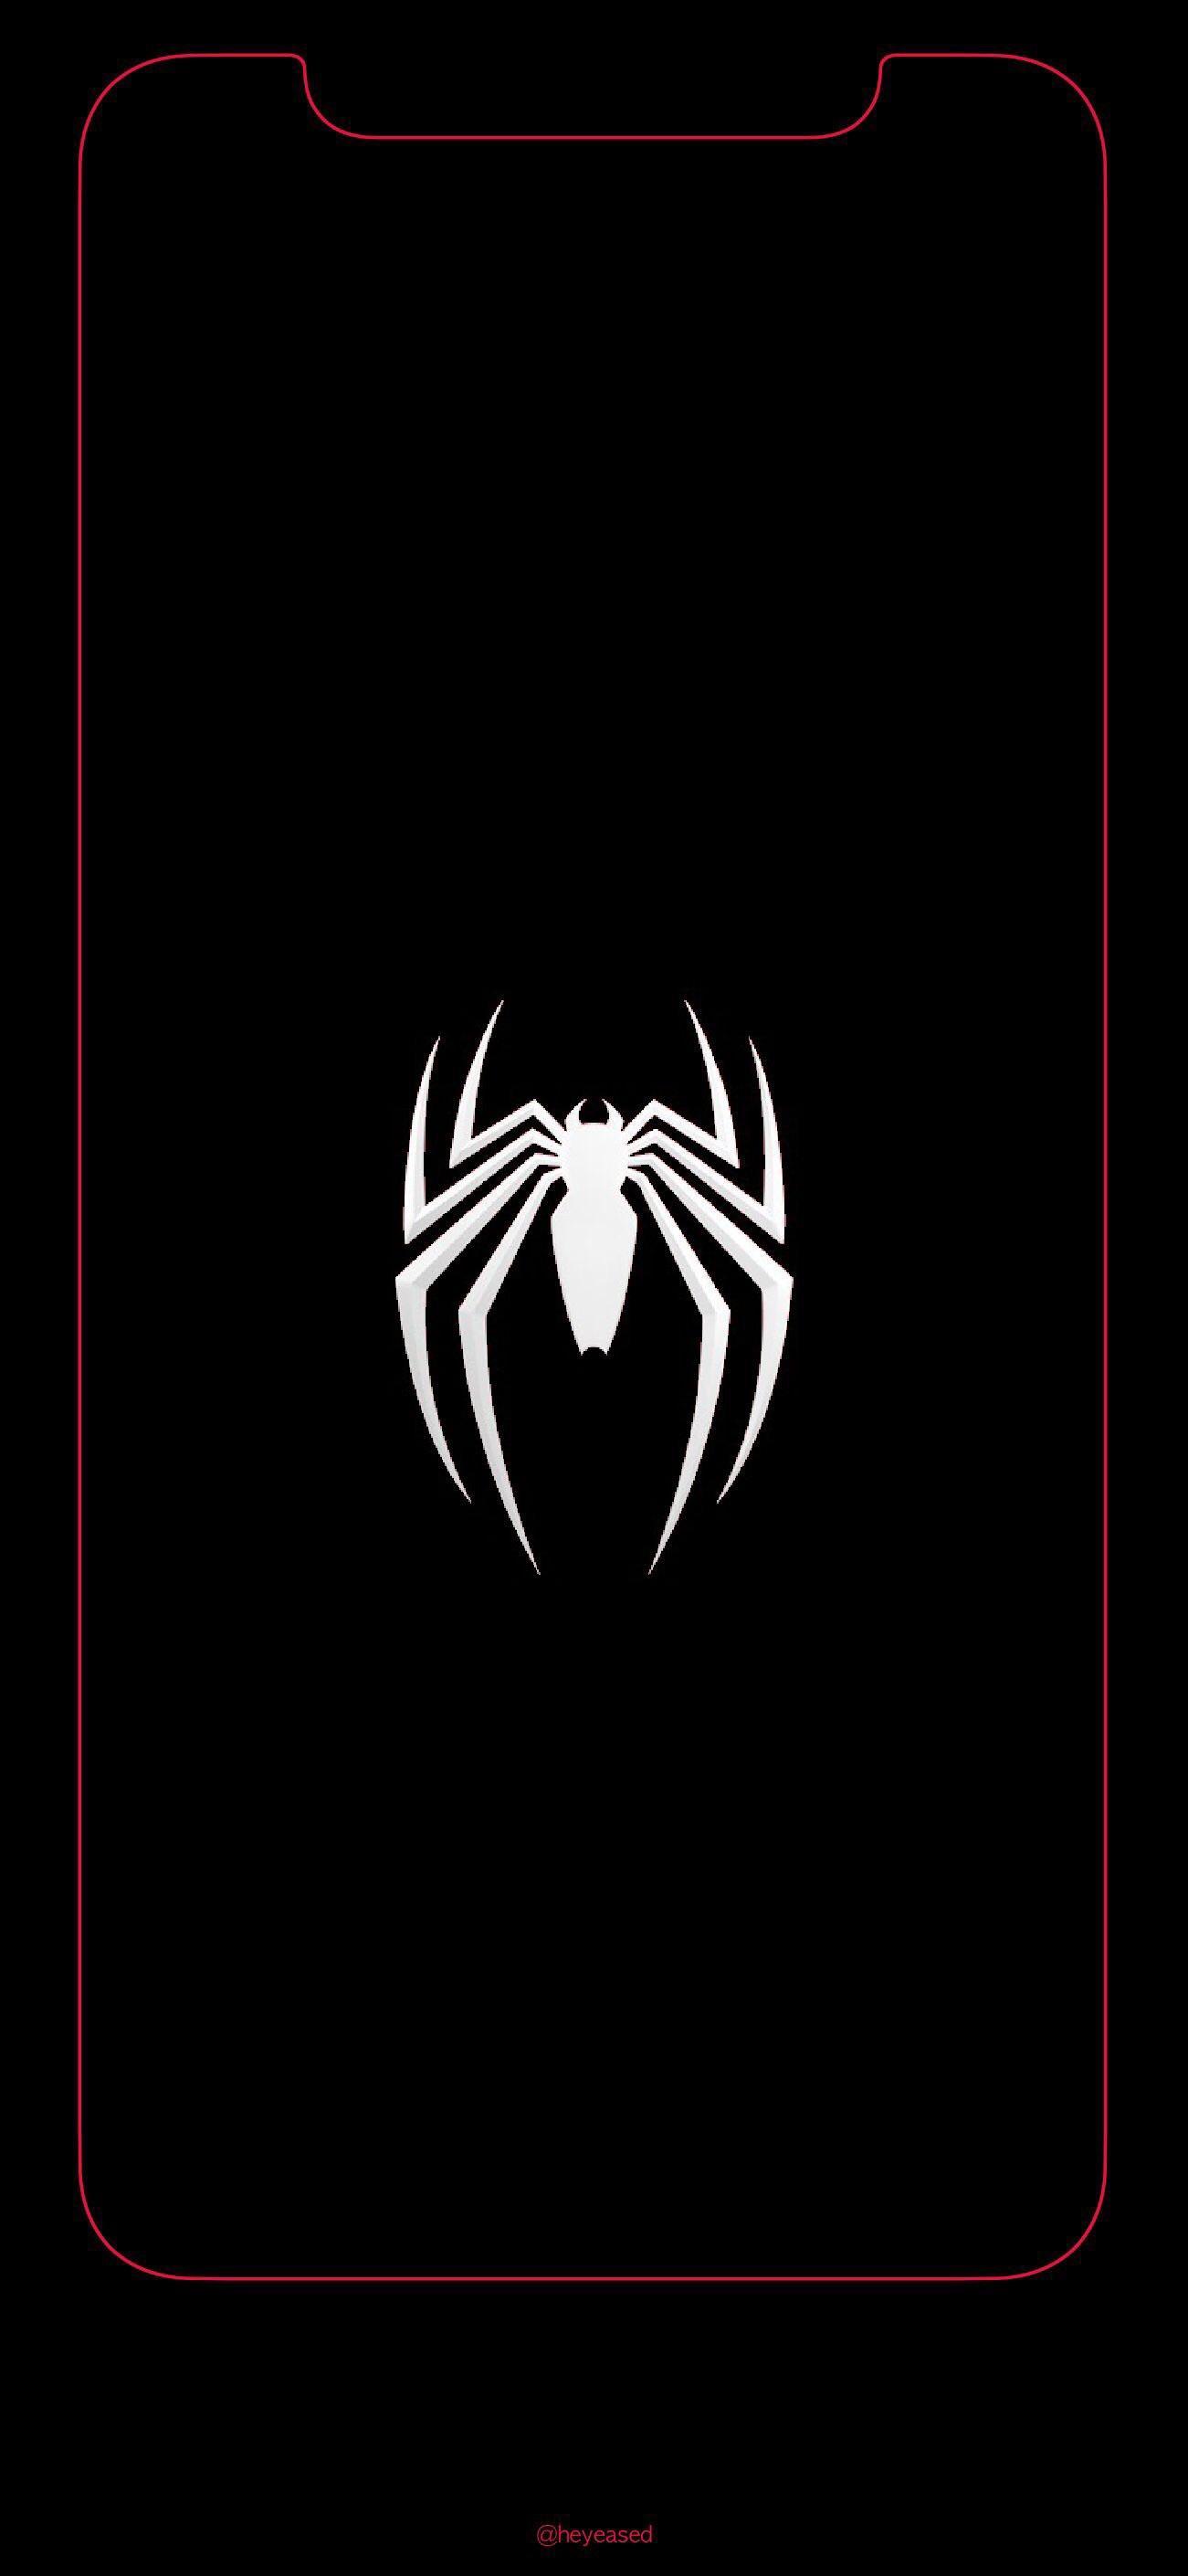 Spiderman iPhone X Wallpapers - Top Free Spiderman iPhone ...